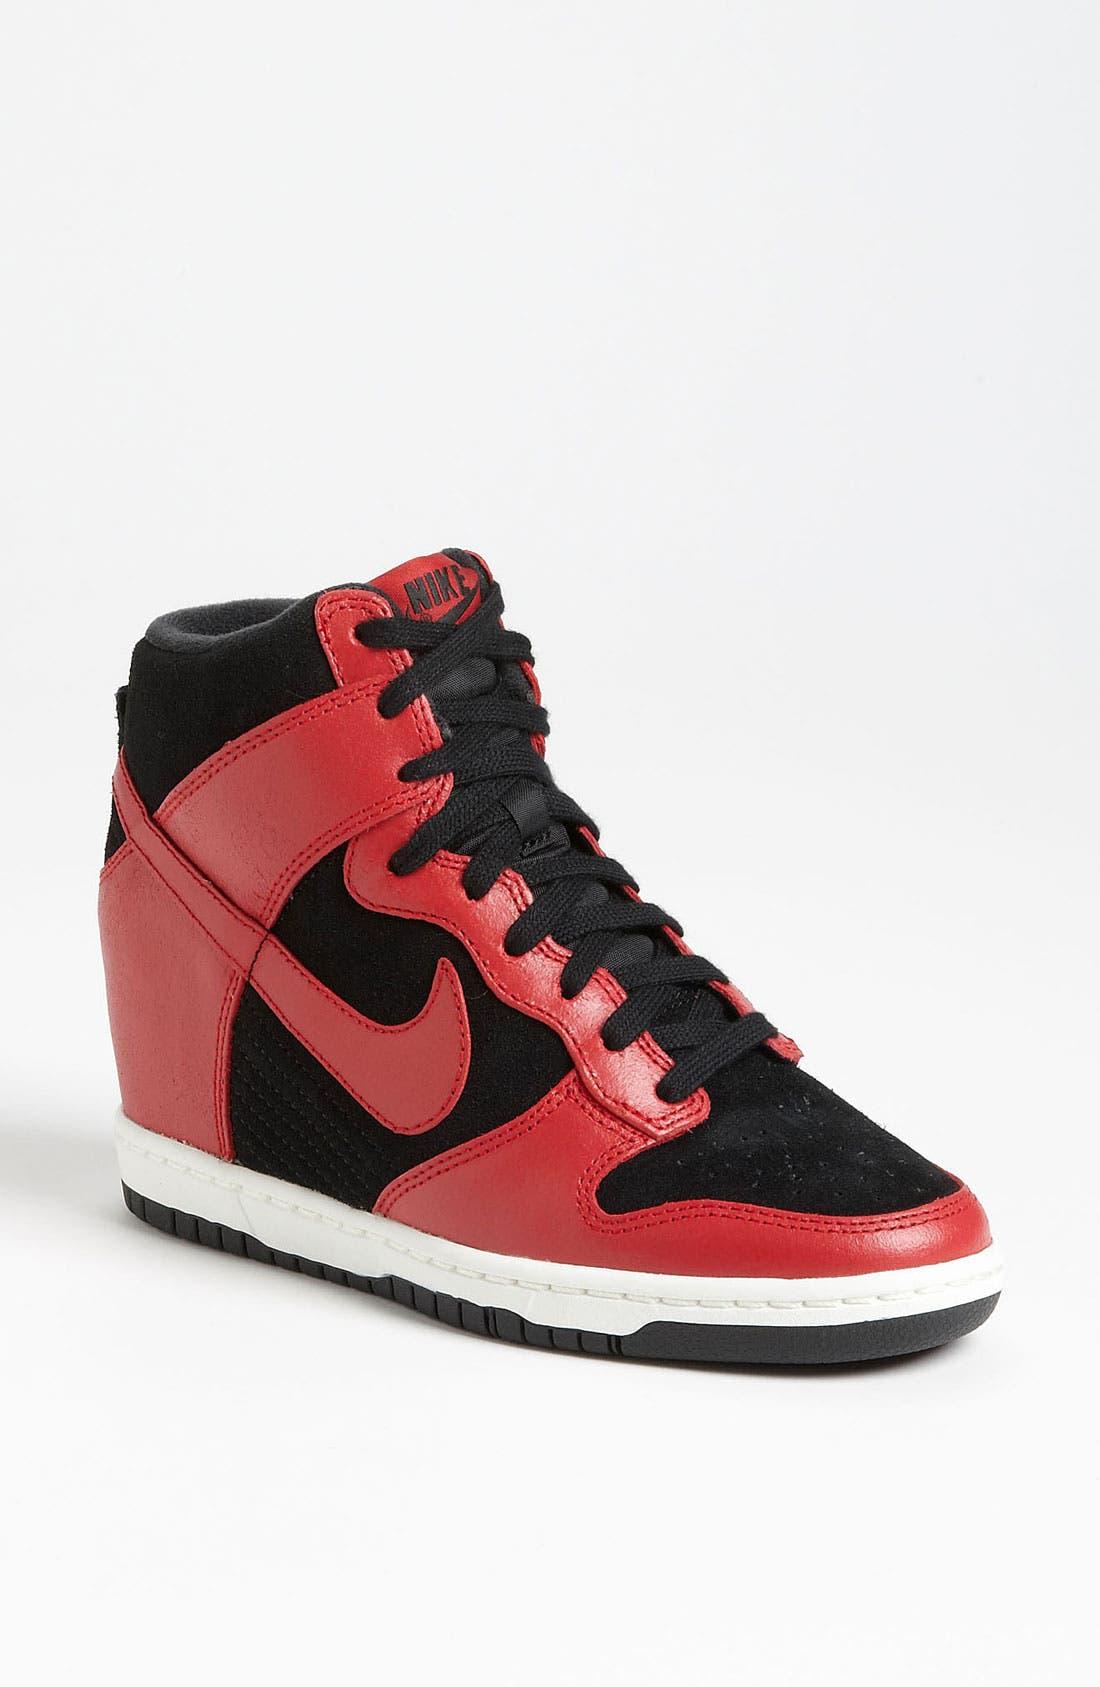 Alternate Image 1 Selected - Nike 'Dunk Sky Hi' Wedge Sneaker (Women)